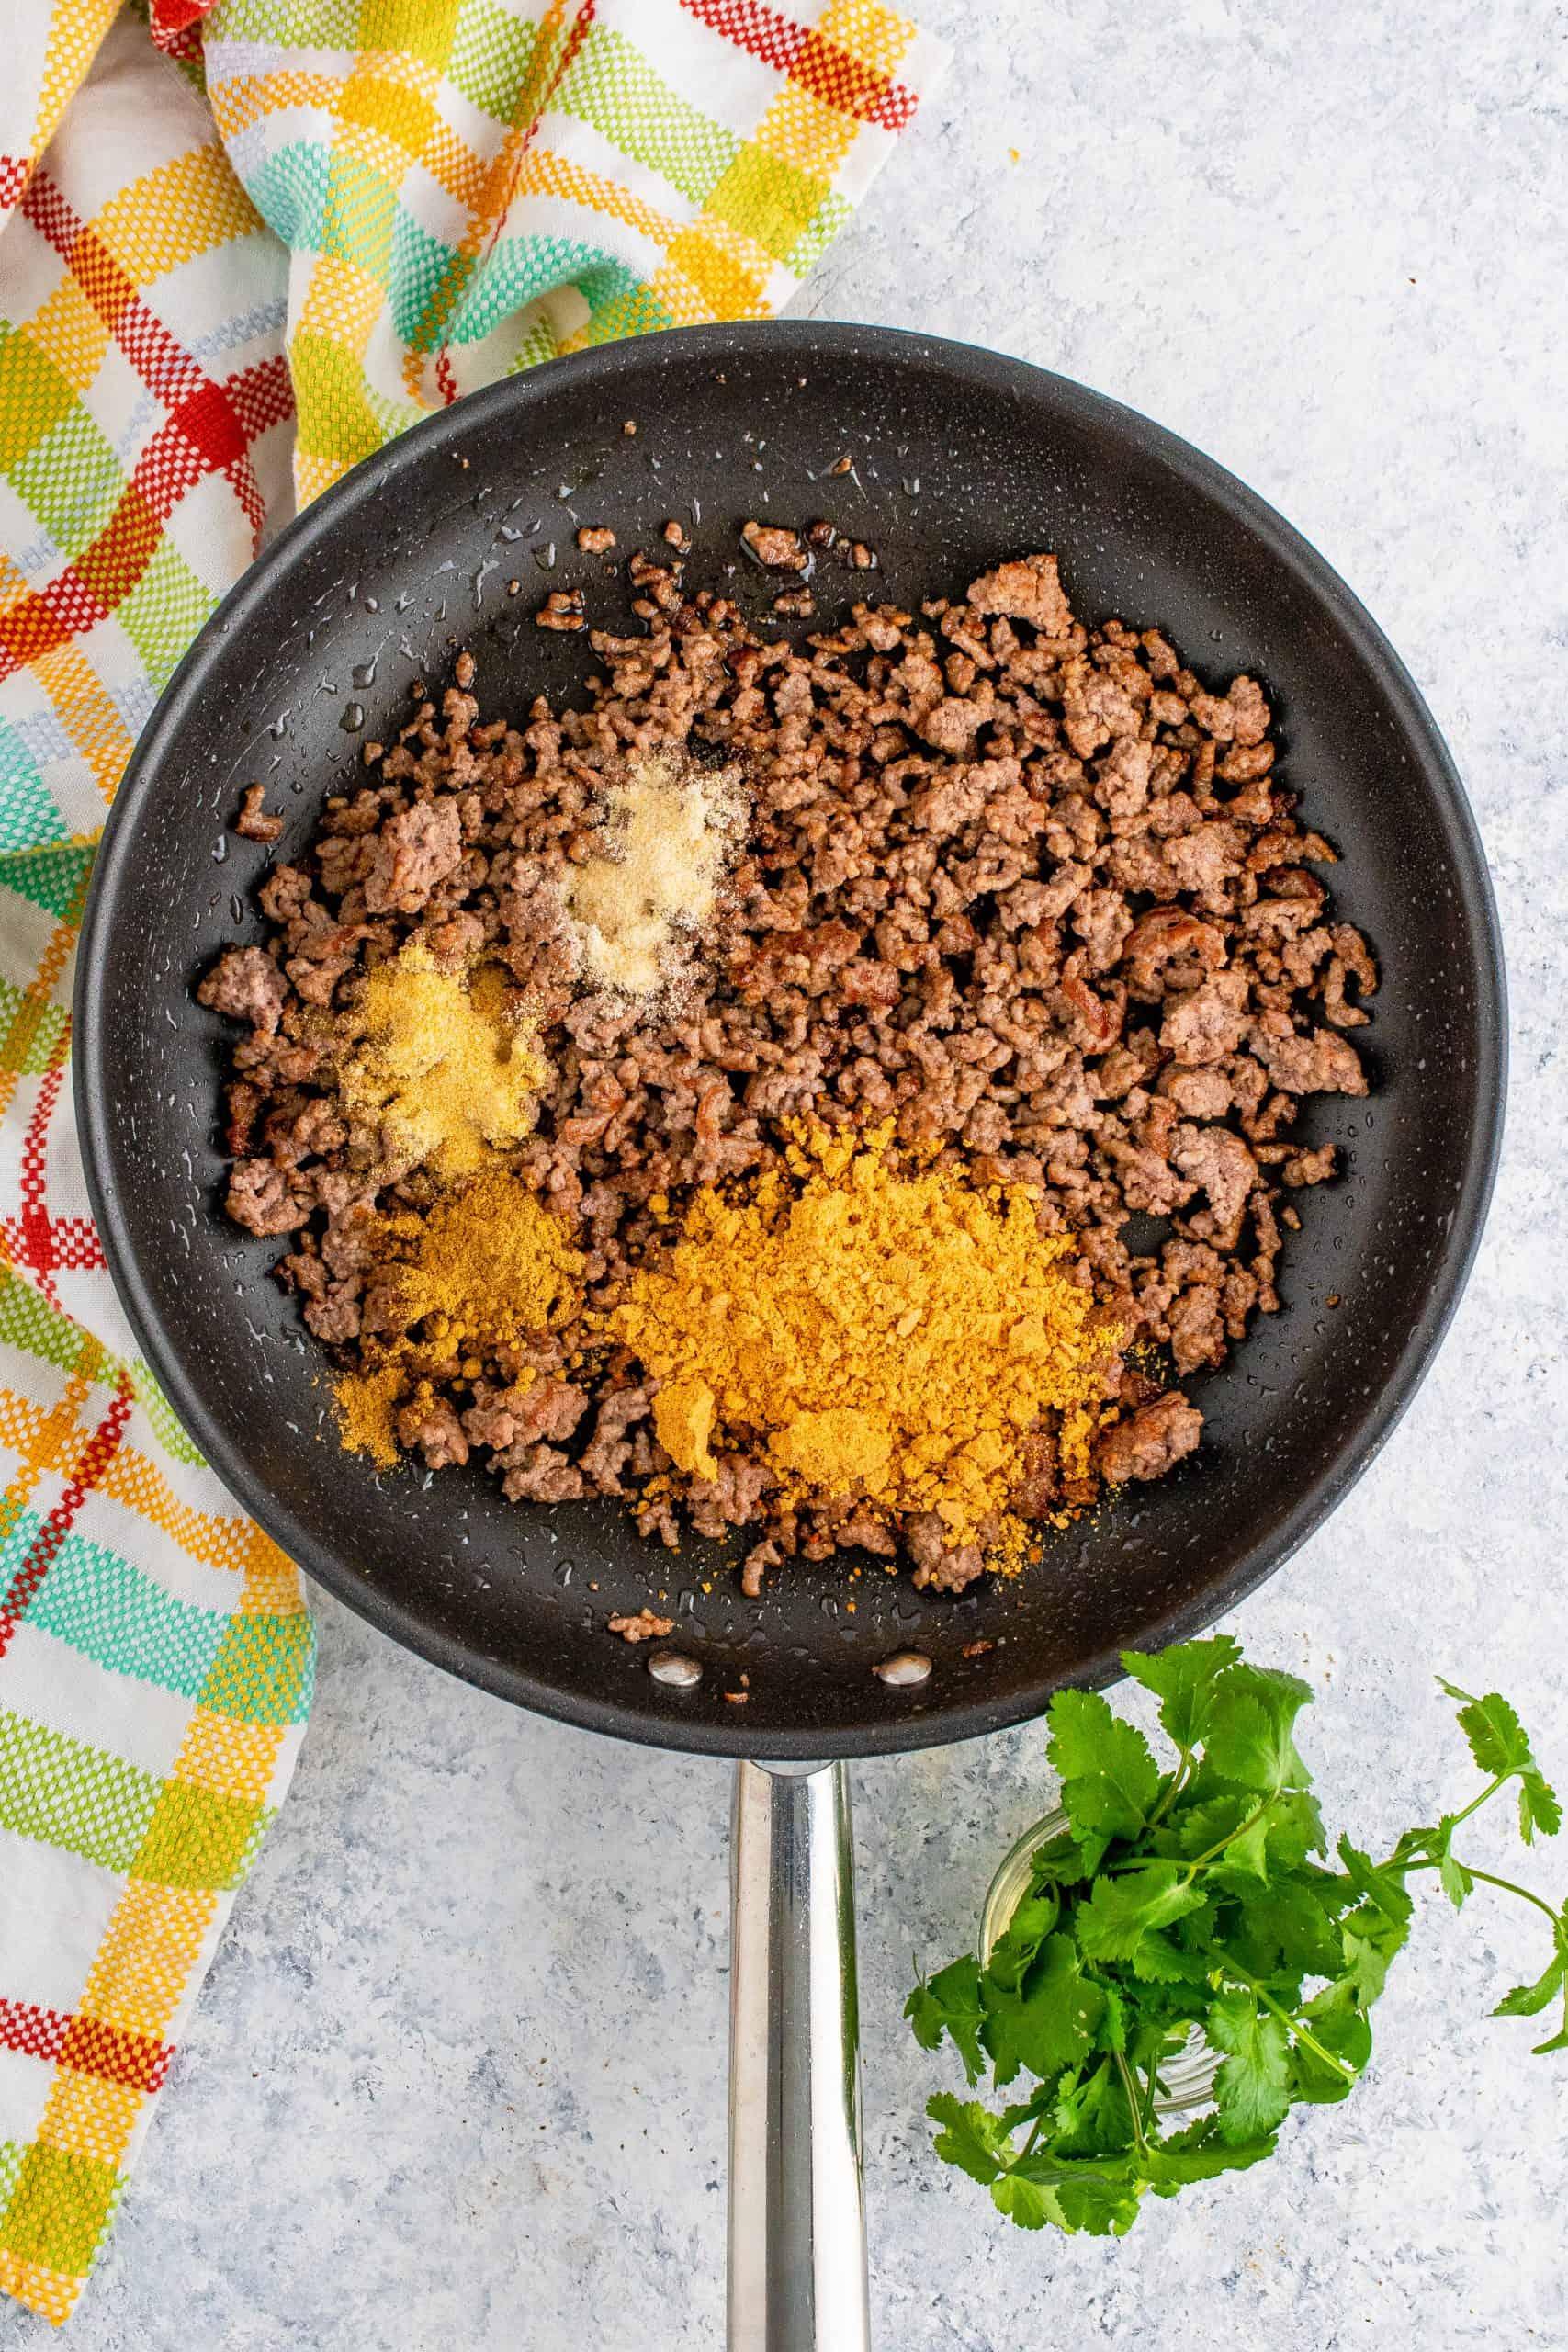 Taco seasoning, ground cumin, garlic powder and onion powder added to ground beef